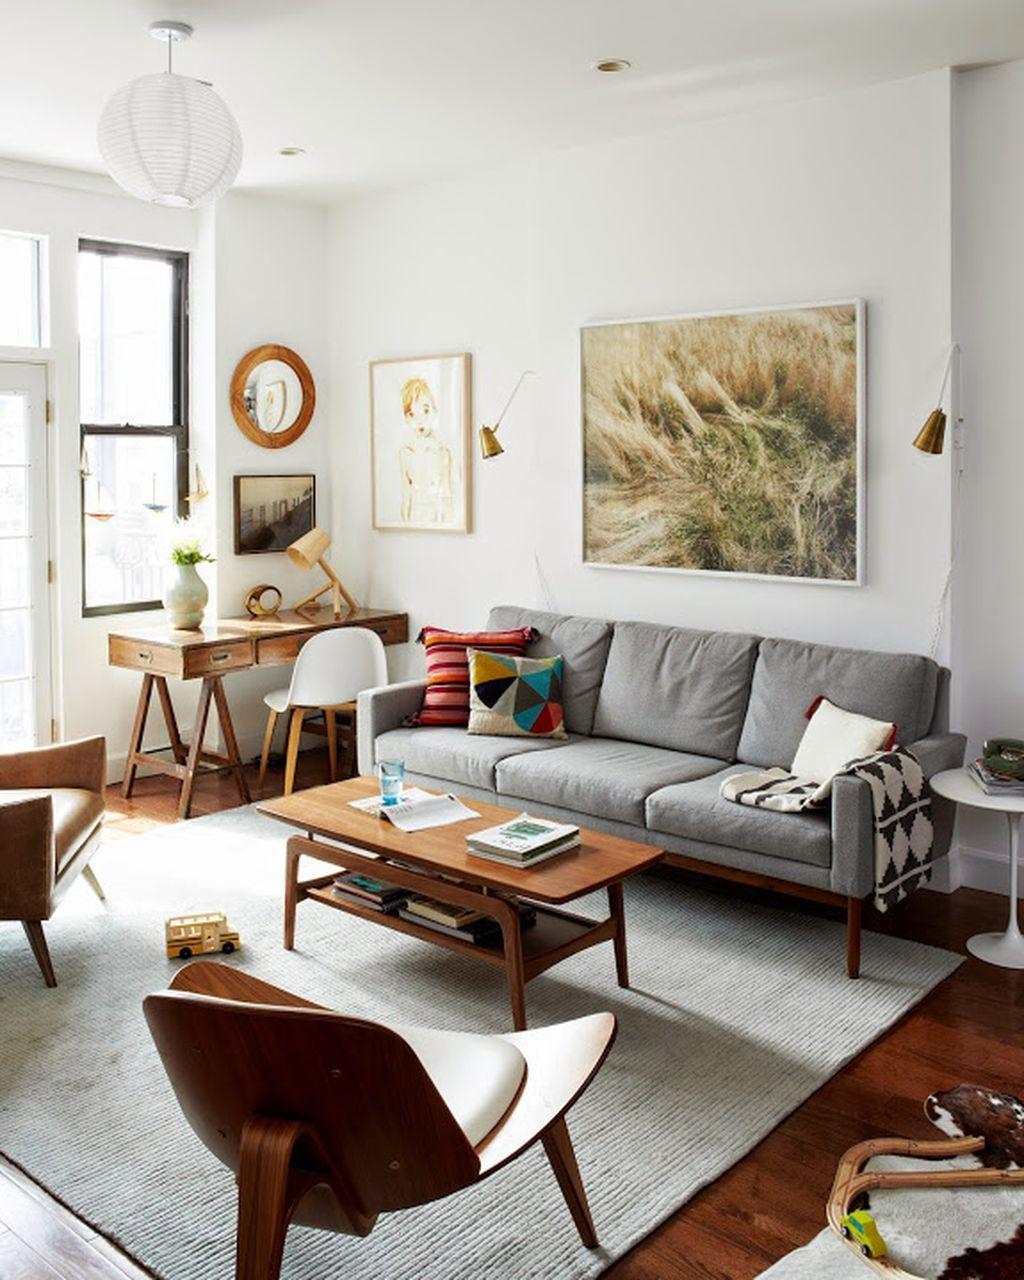 Mid century modern apartment decoration ideas 21 - ROUNDECOR